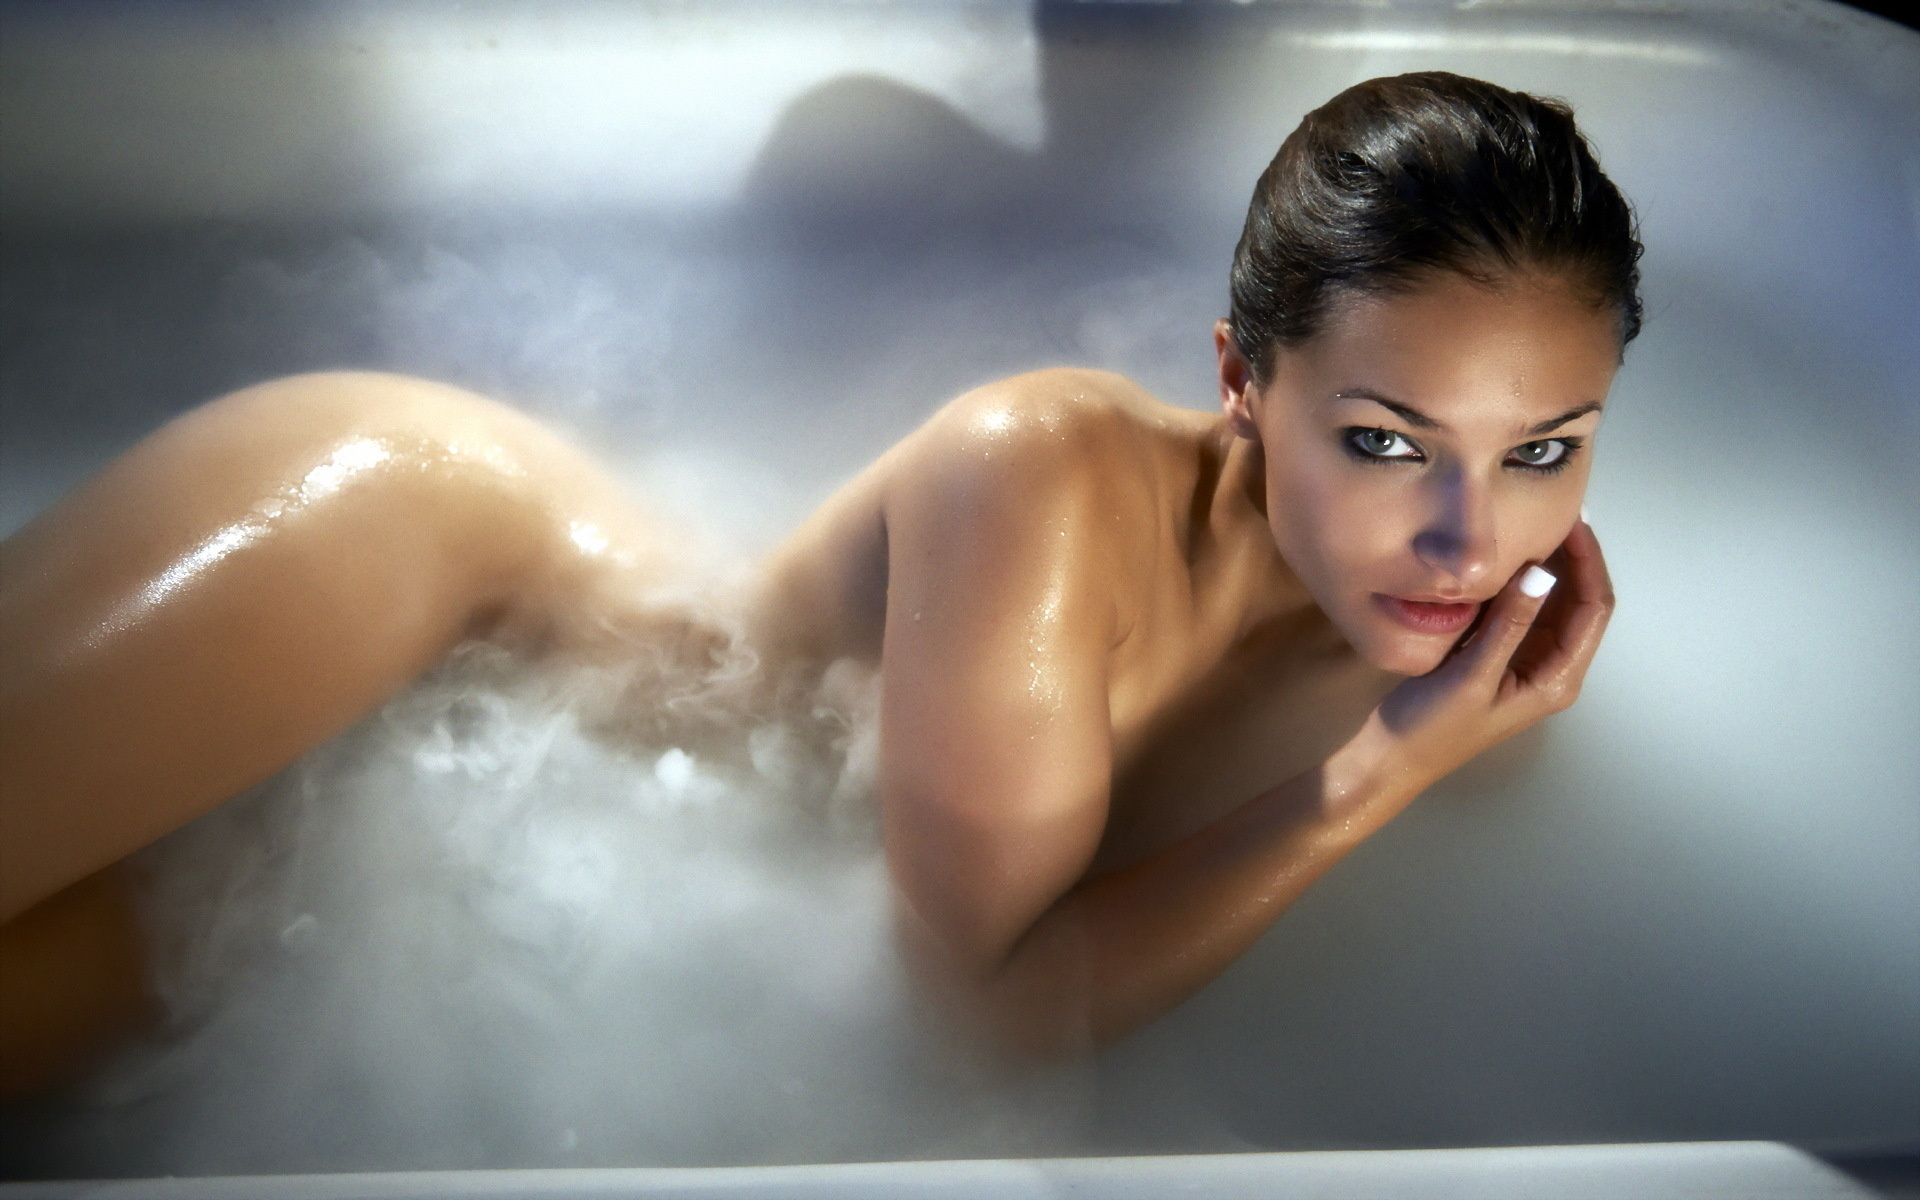 Обнаженная Девушка В Ванне